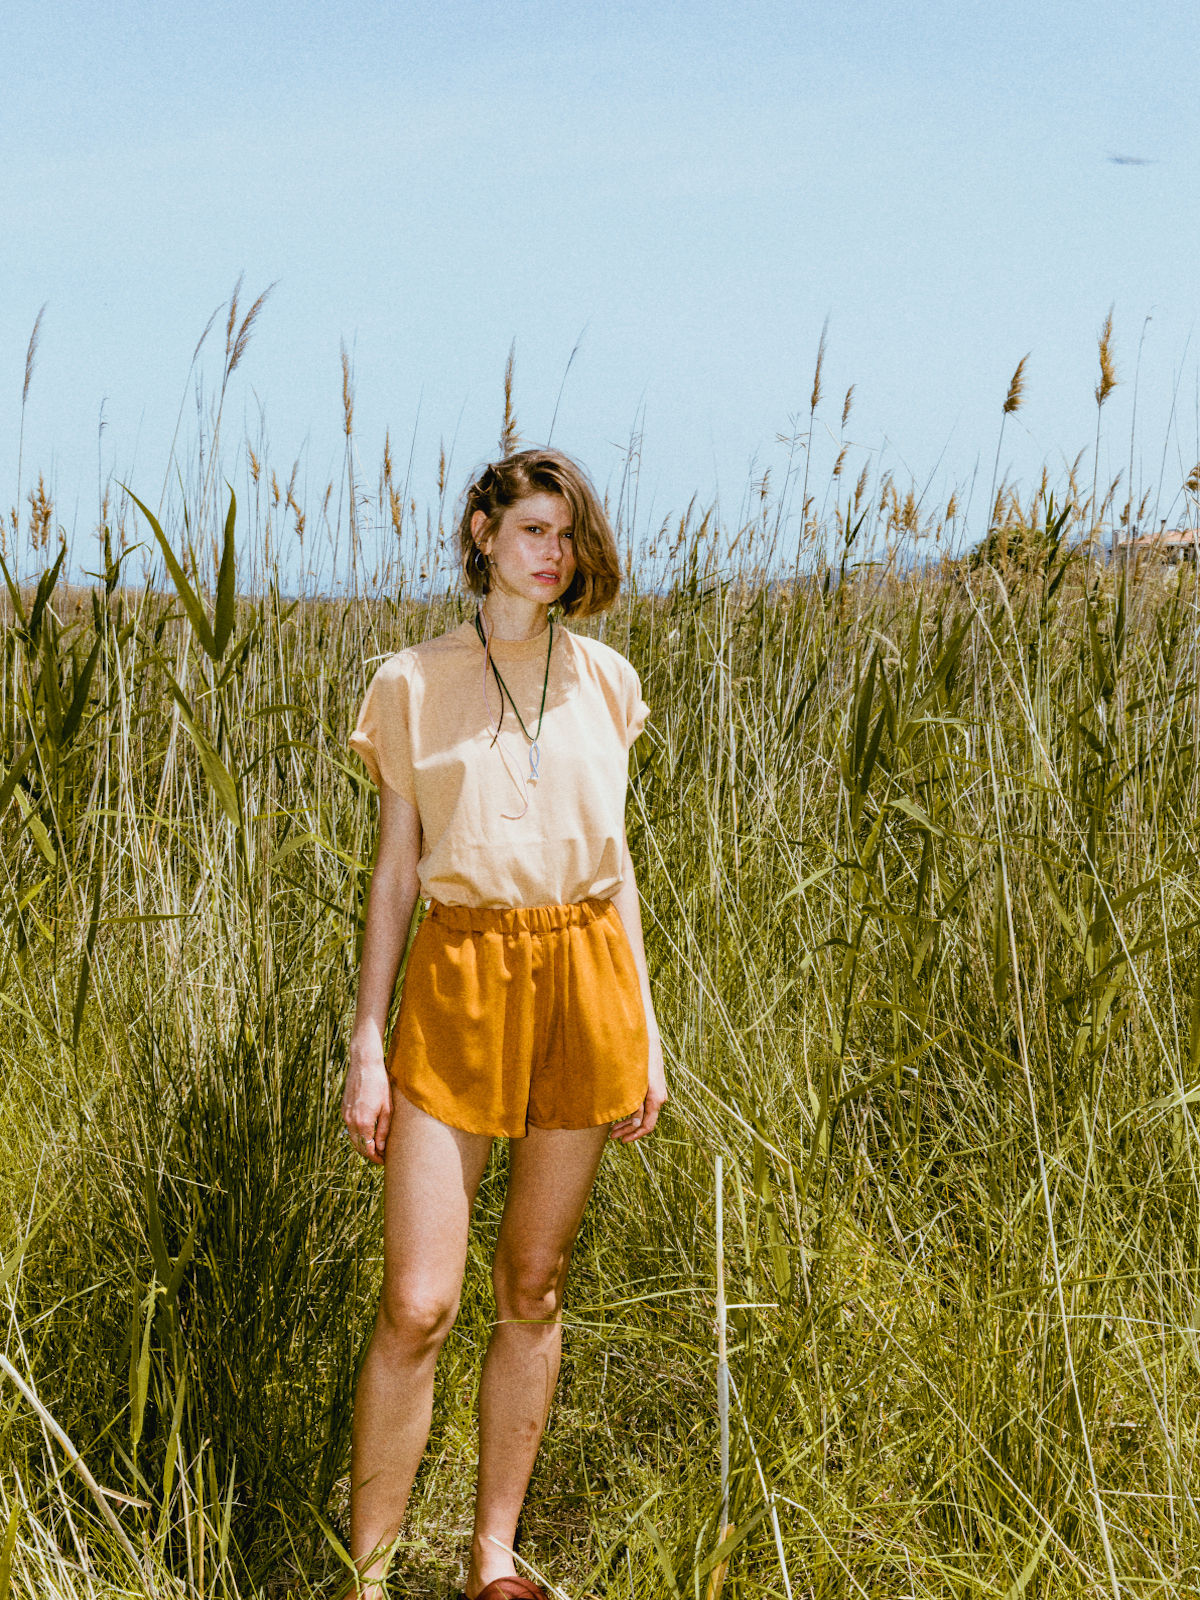 Beige t-shirt with orange shorts